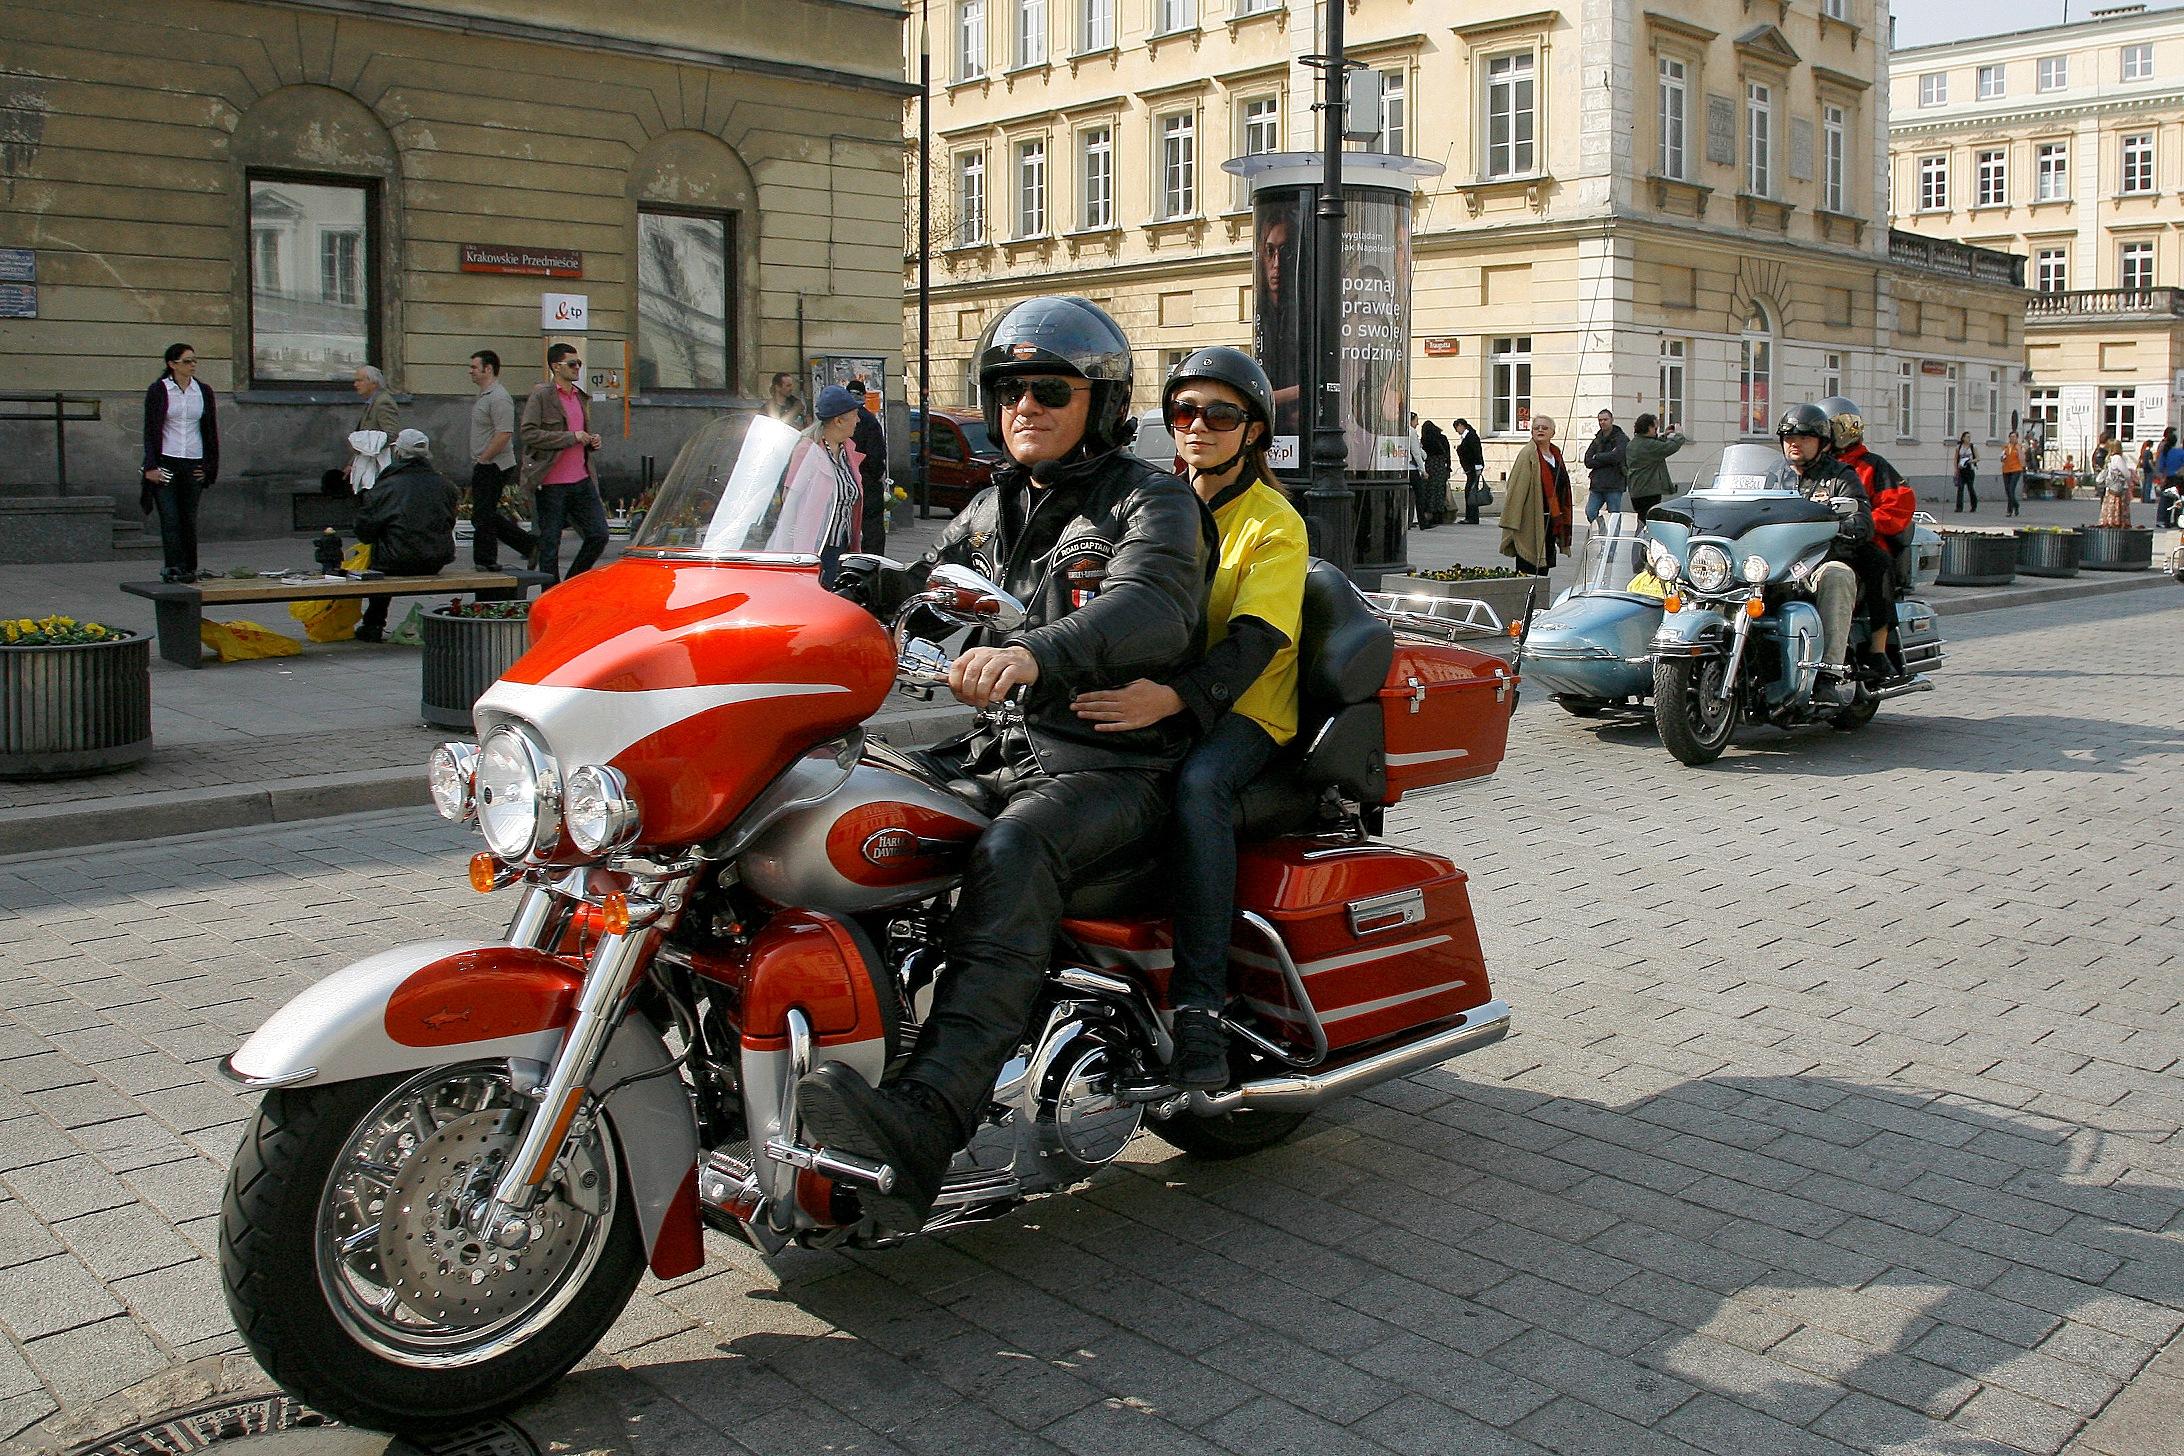 Harley'ada Marzeń 2009